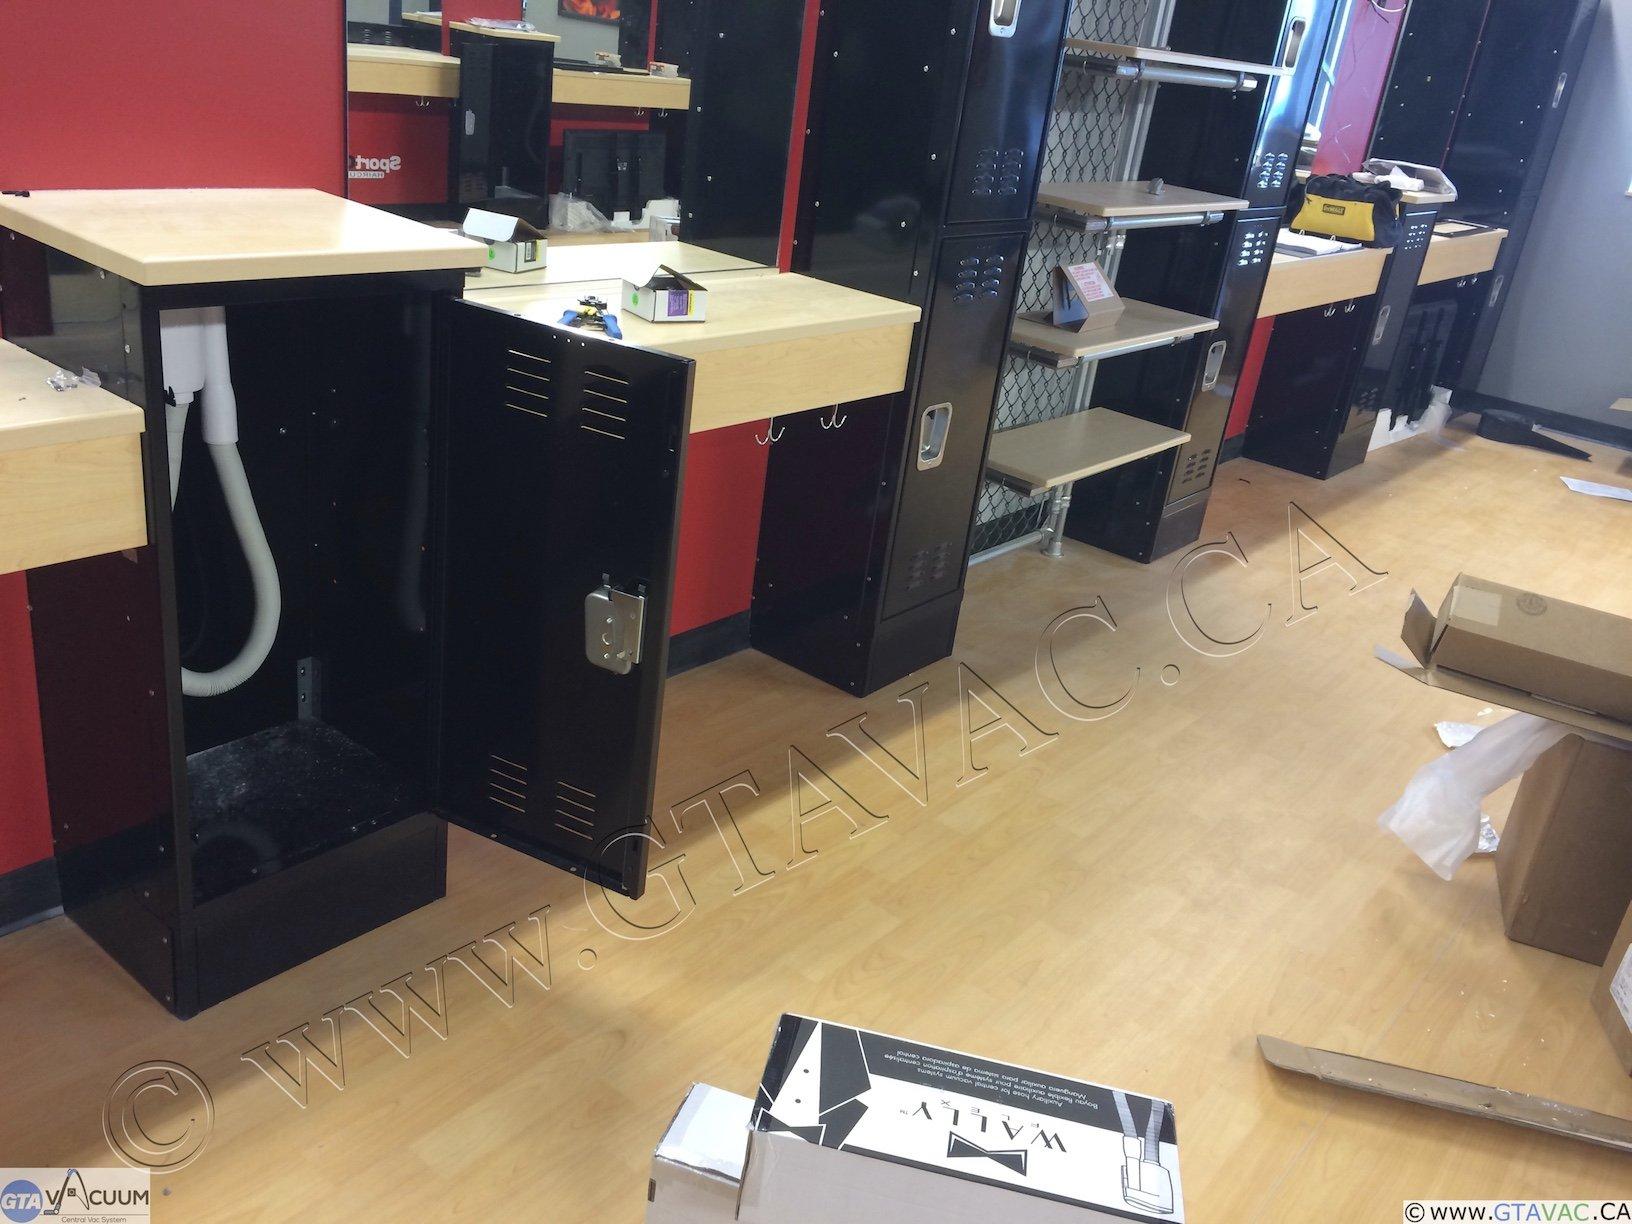 Sport Clips Central Vacuum WalyFLex Installation After 3 1